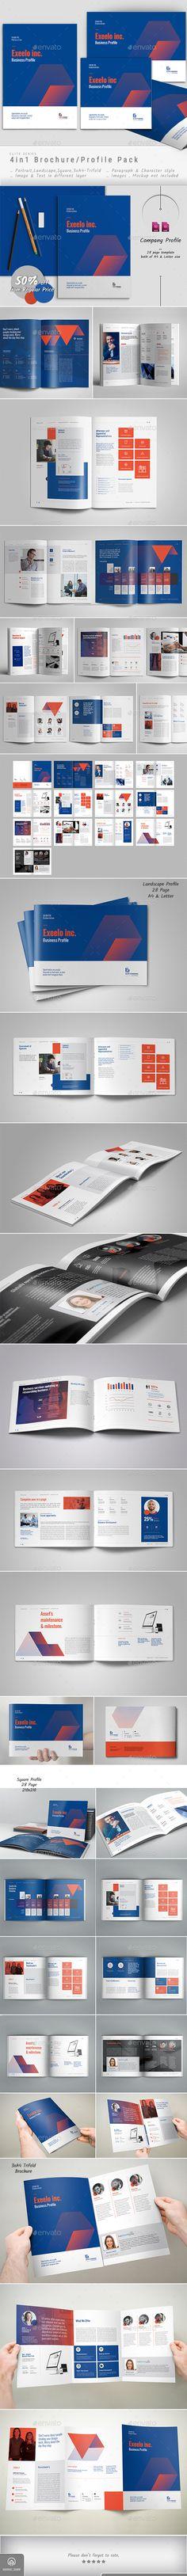 Company Profile Bundle/Pack - Corporate Brochures